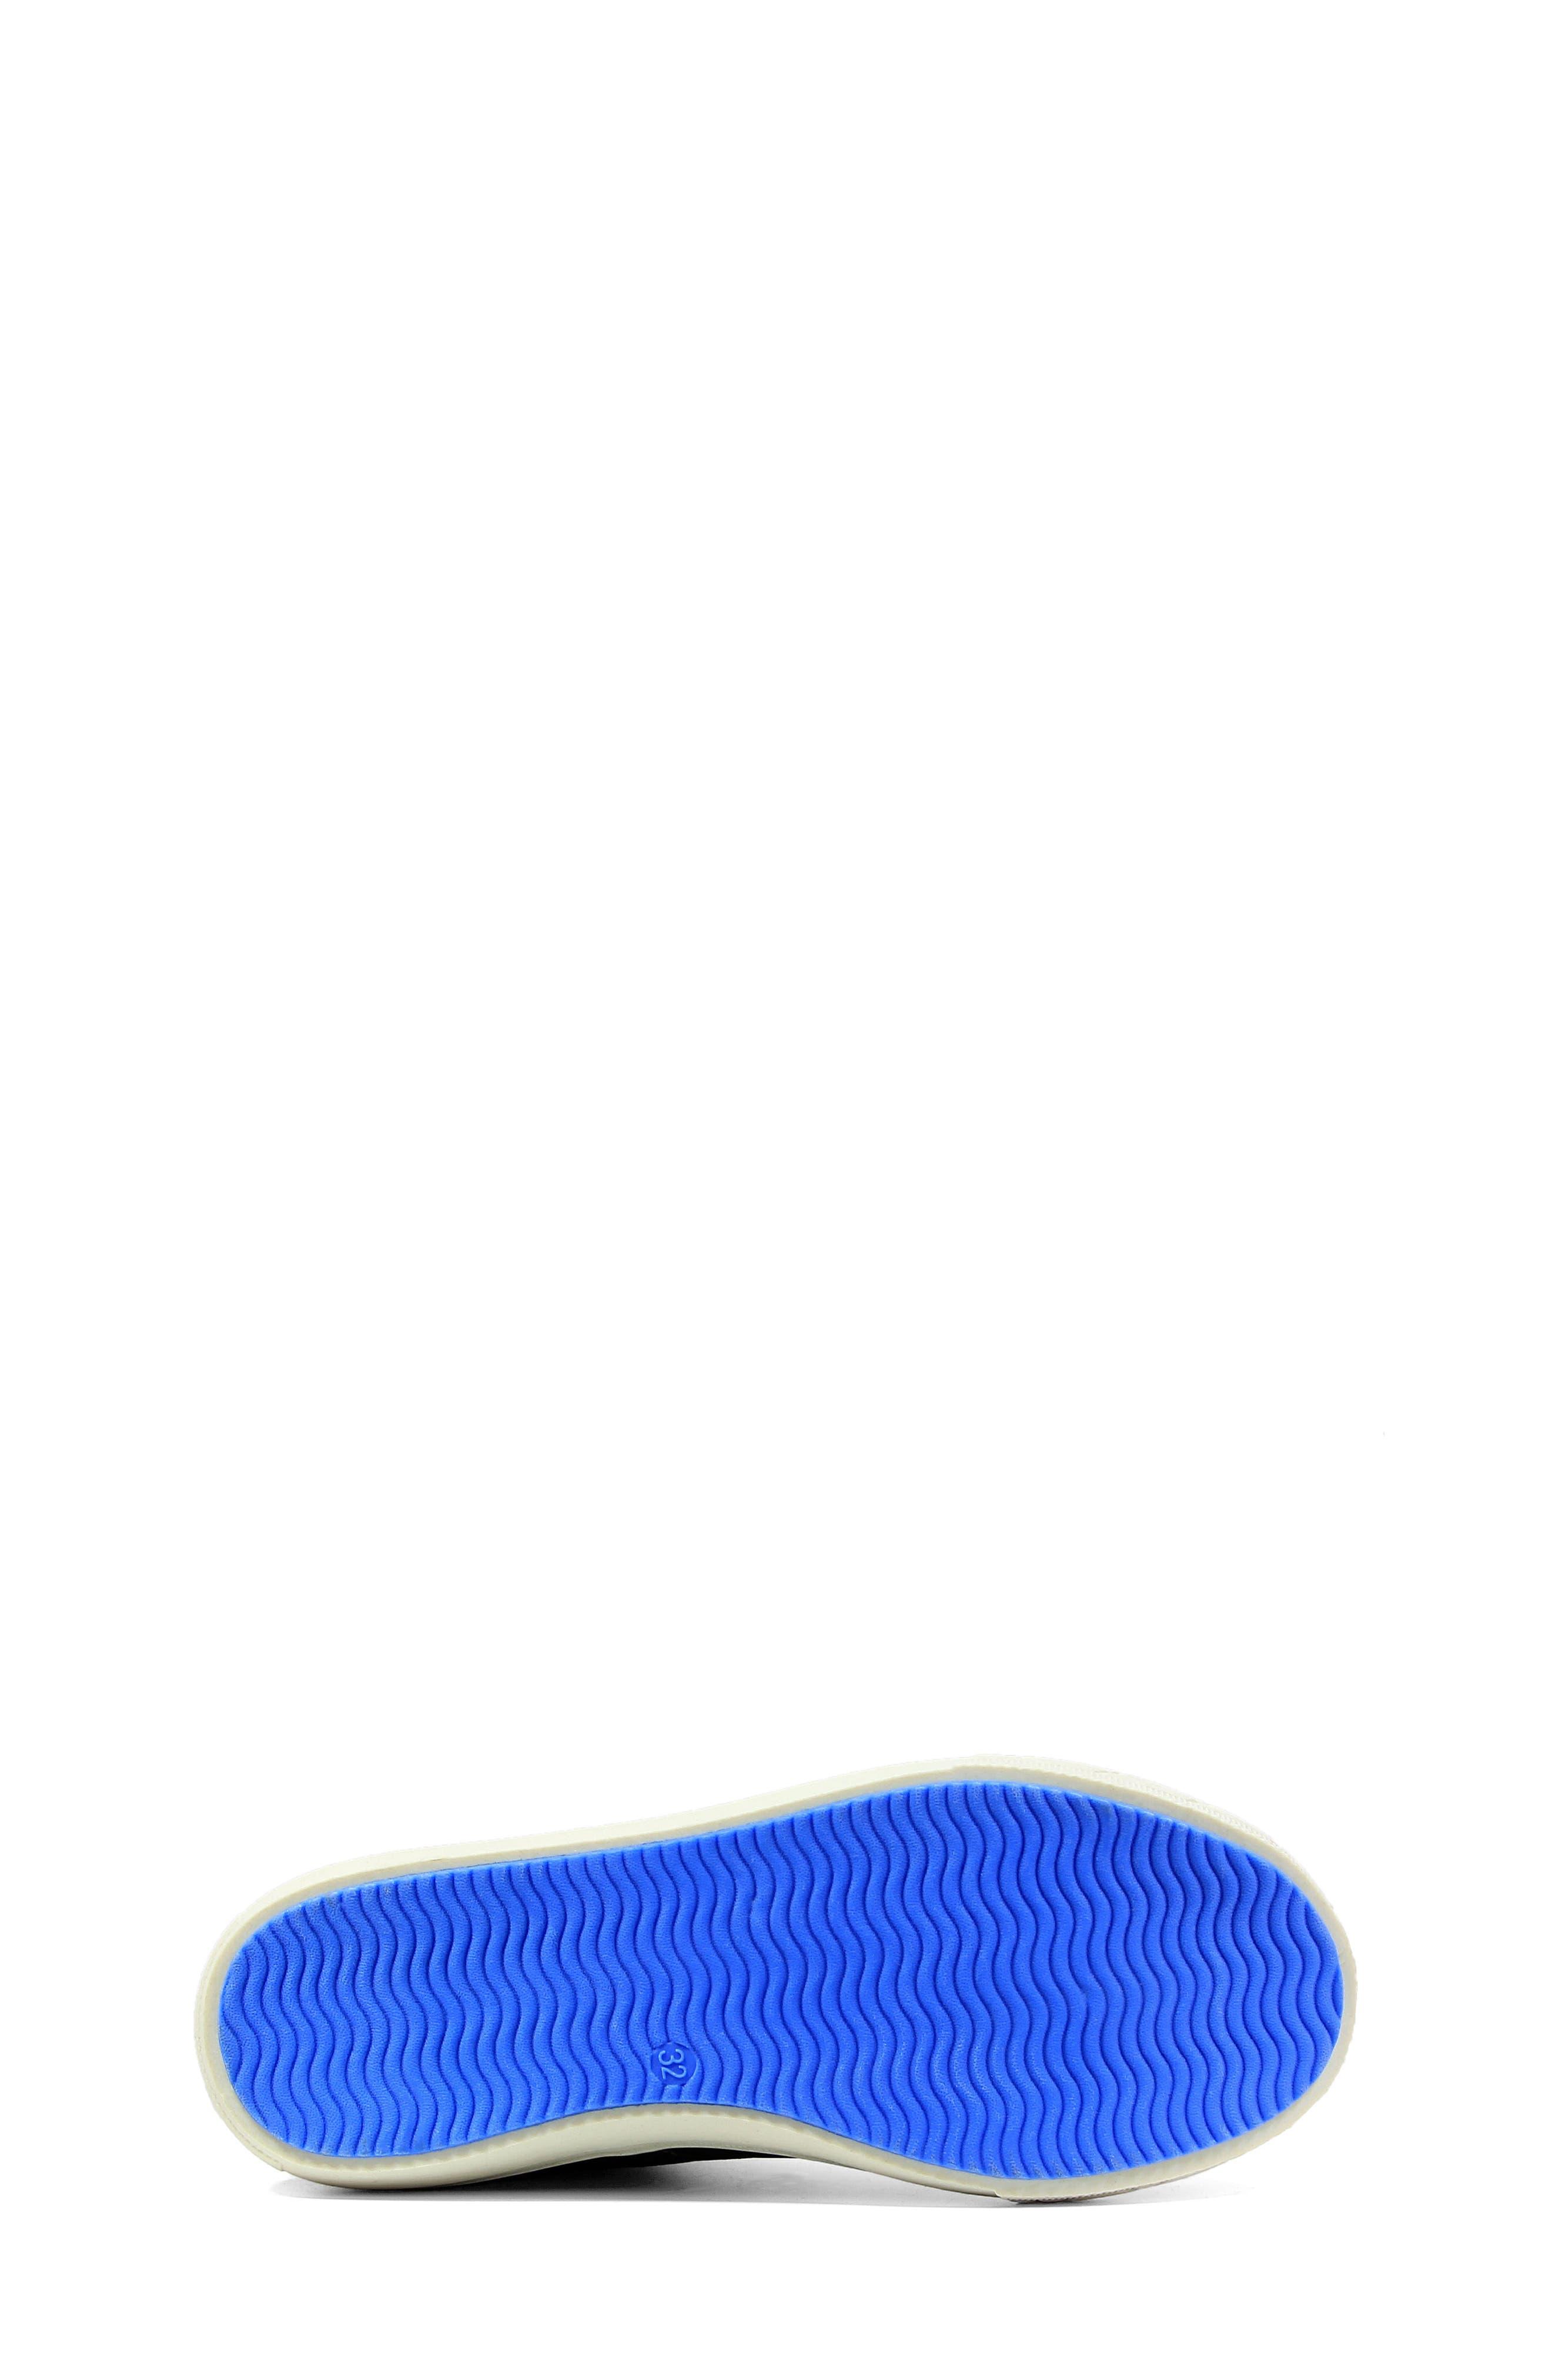 Curb Chukka Sneaker Boot,                             Alternate thumbnail 5, color,                             BLACK